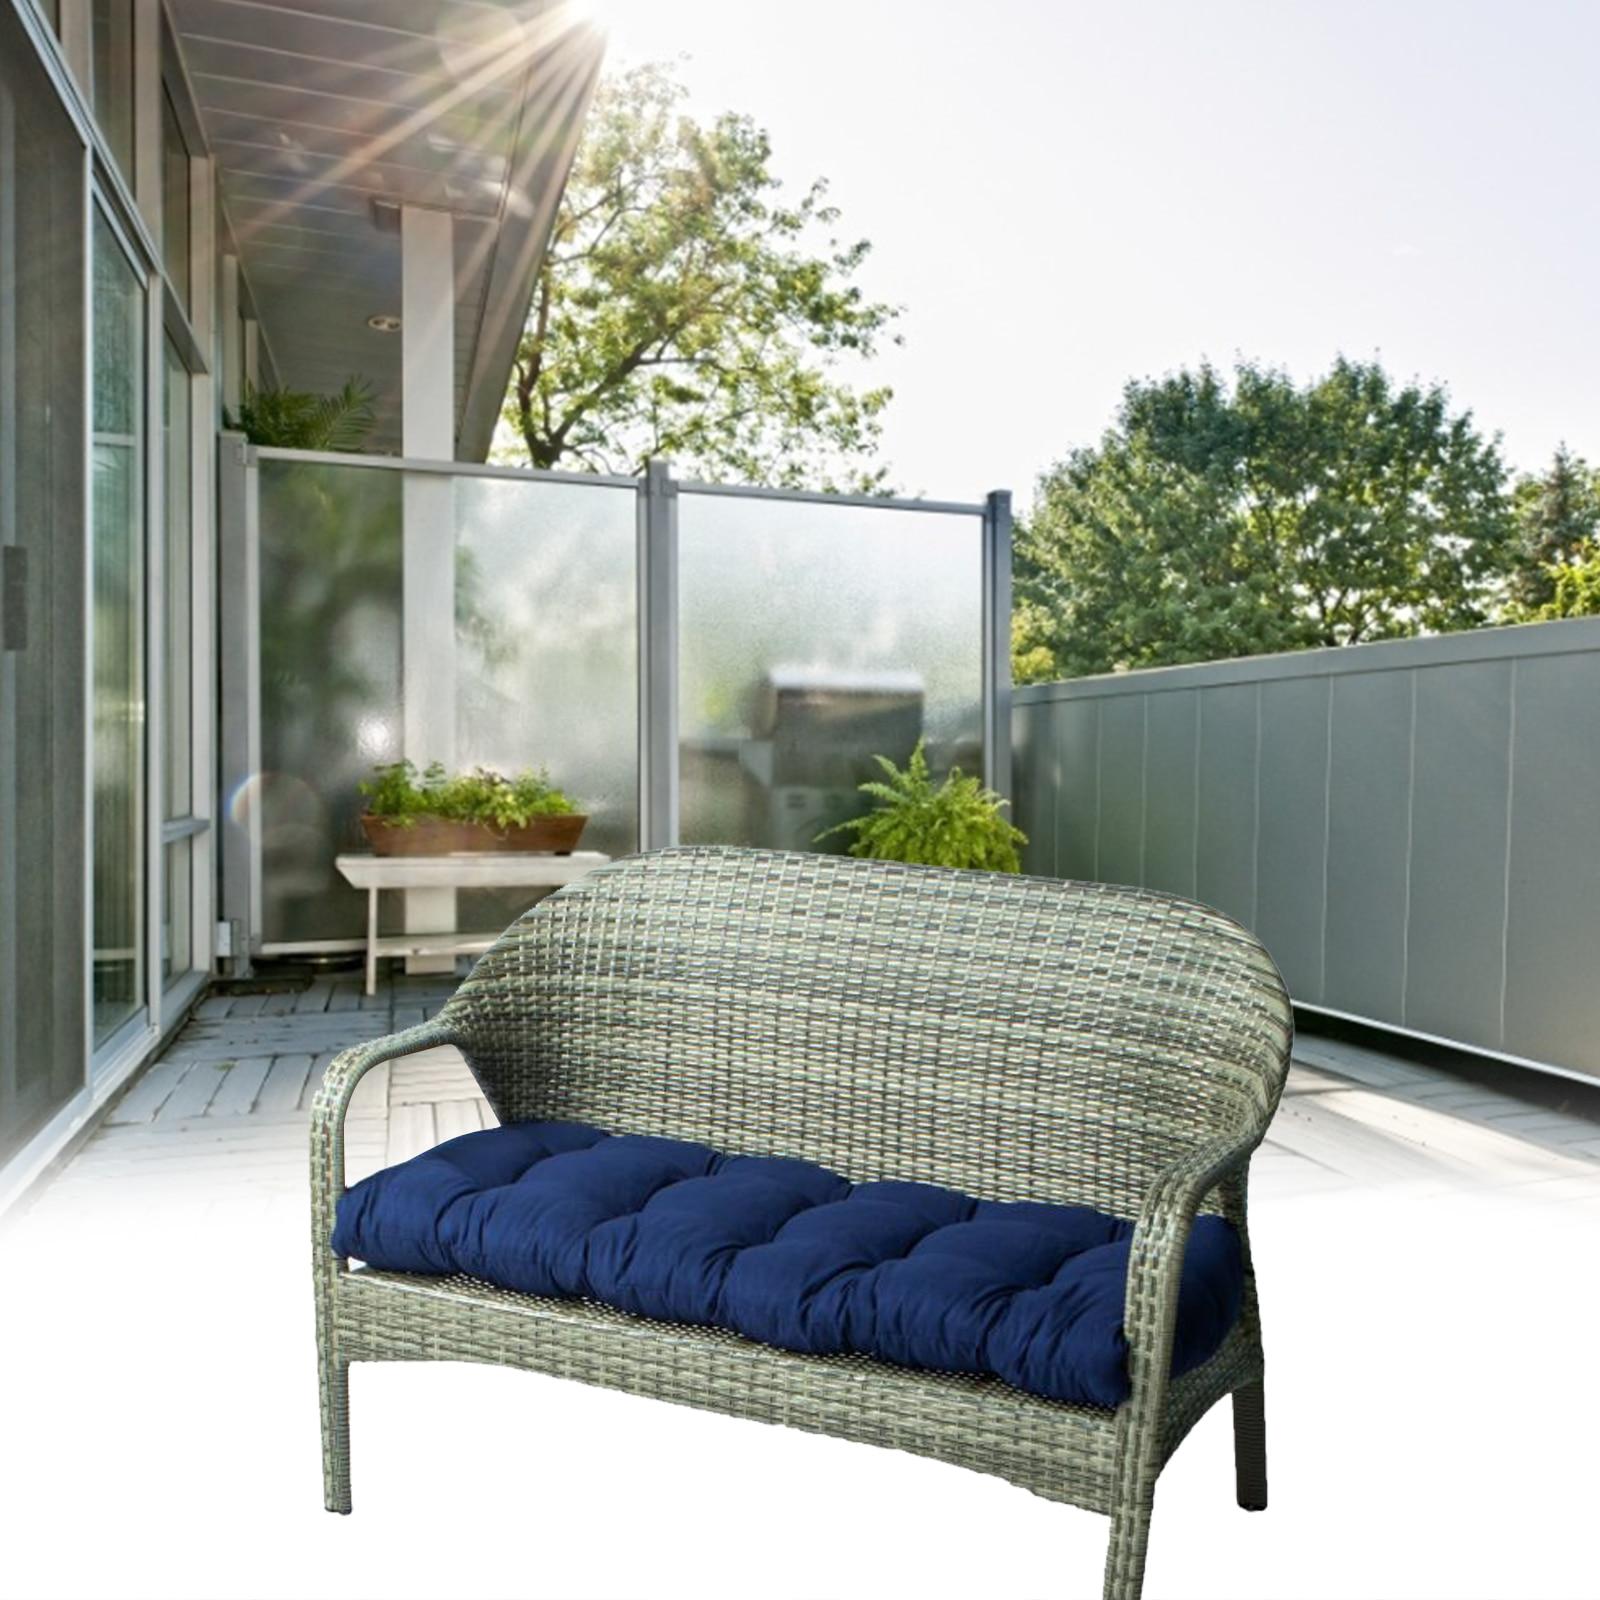 Bench Cushion Outdoor Garden Bench Cushions Rectangle Bench Seat Soft Pad Mat Chaise Swing Chair Cushion For Patio 100x50cm